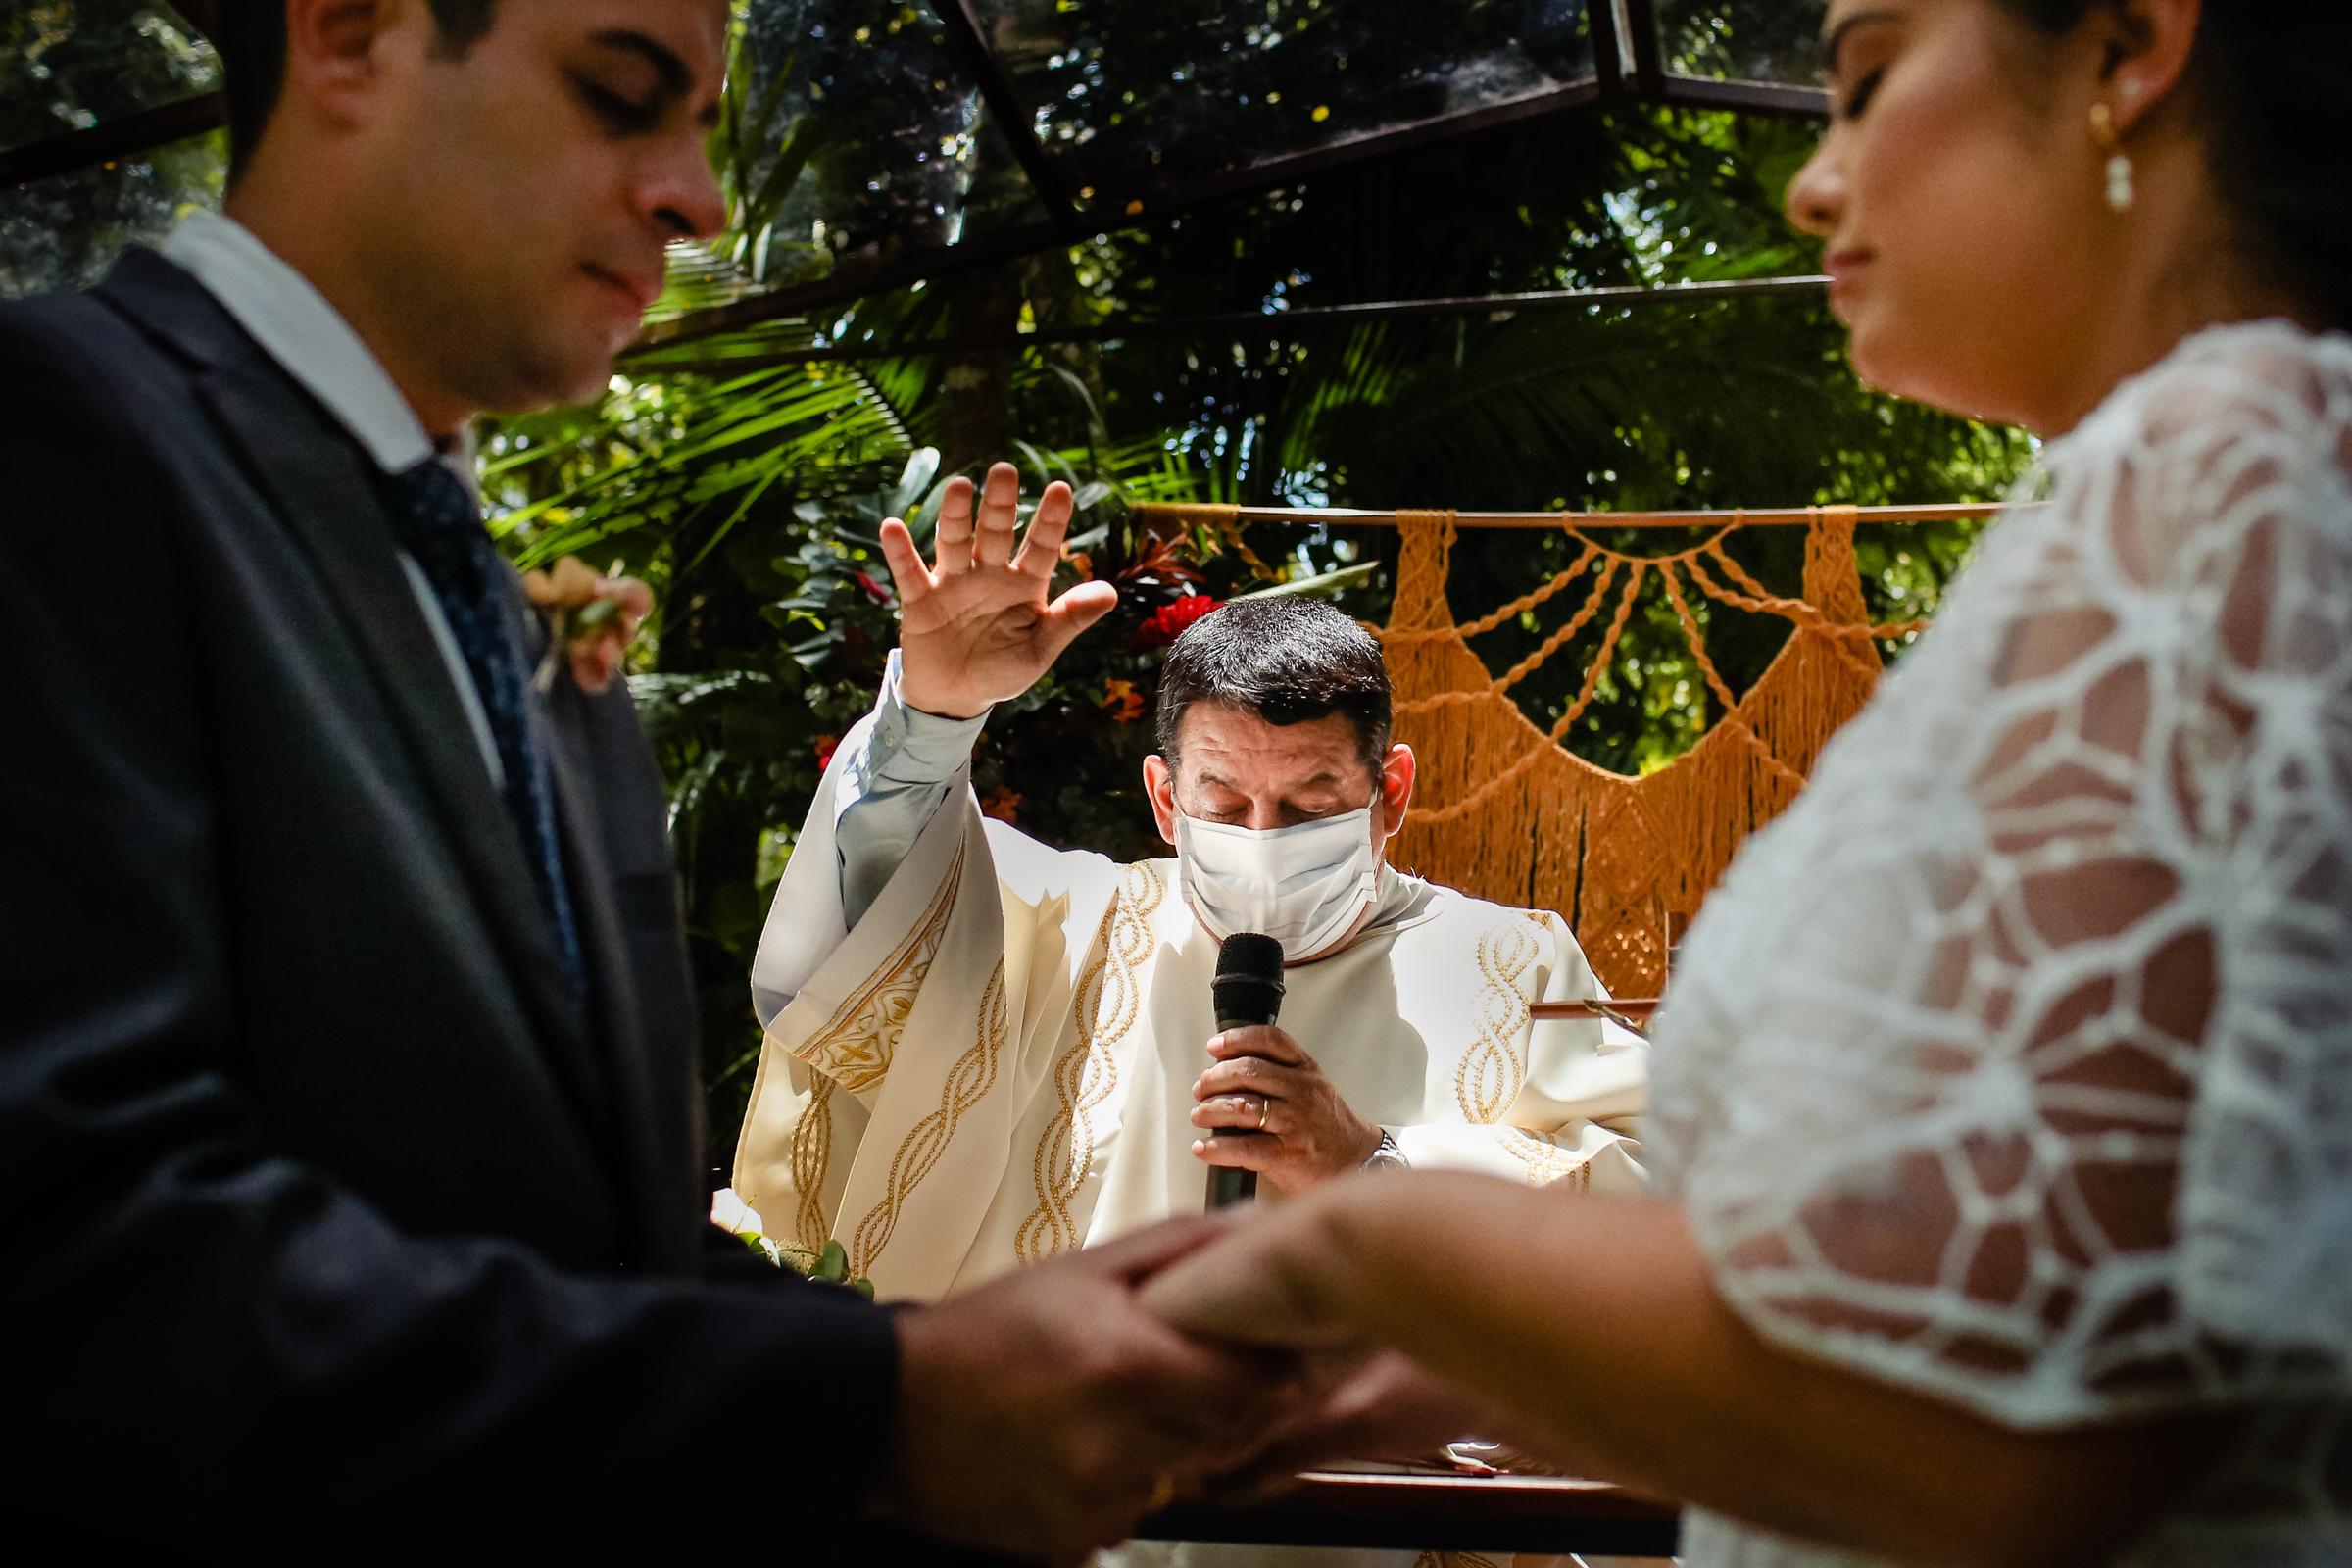 Solemn ceremony moment with officiant - photo by Área da Fotografia